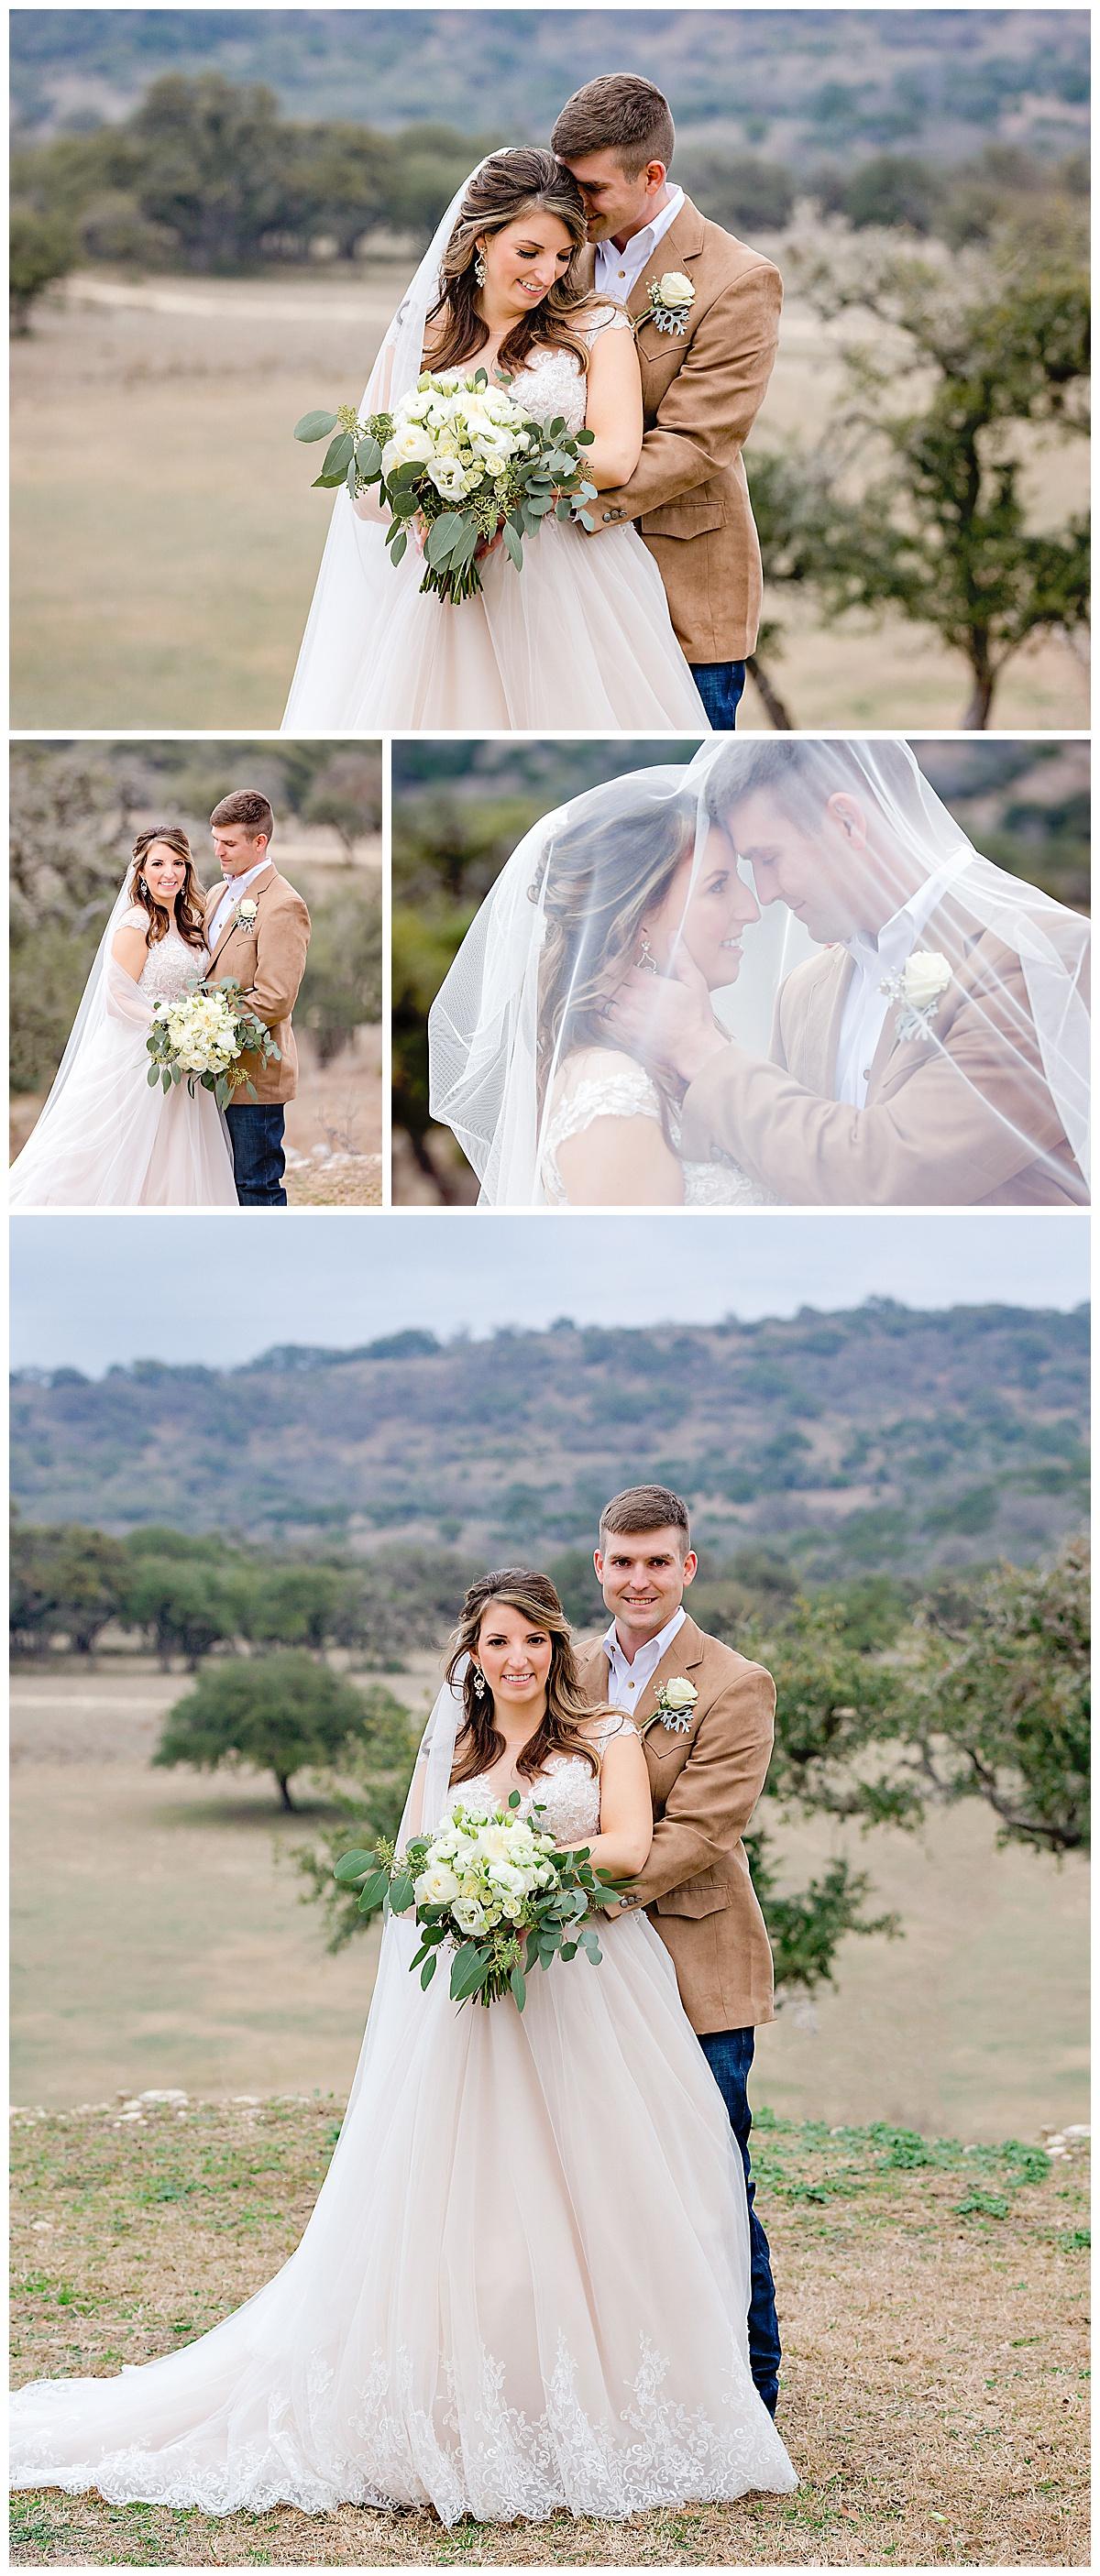 Wedding-Photographer-Texas-Hill-Country-Happy-H-Ranch-Comfor-Texas-Carly-Barton-Photography_0050.jpg